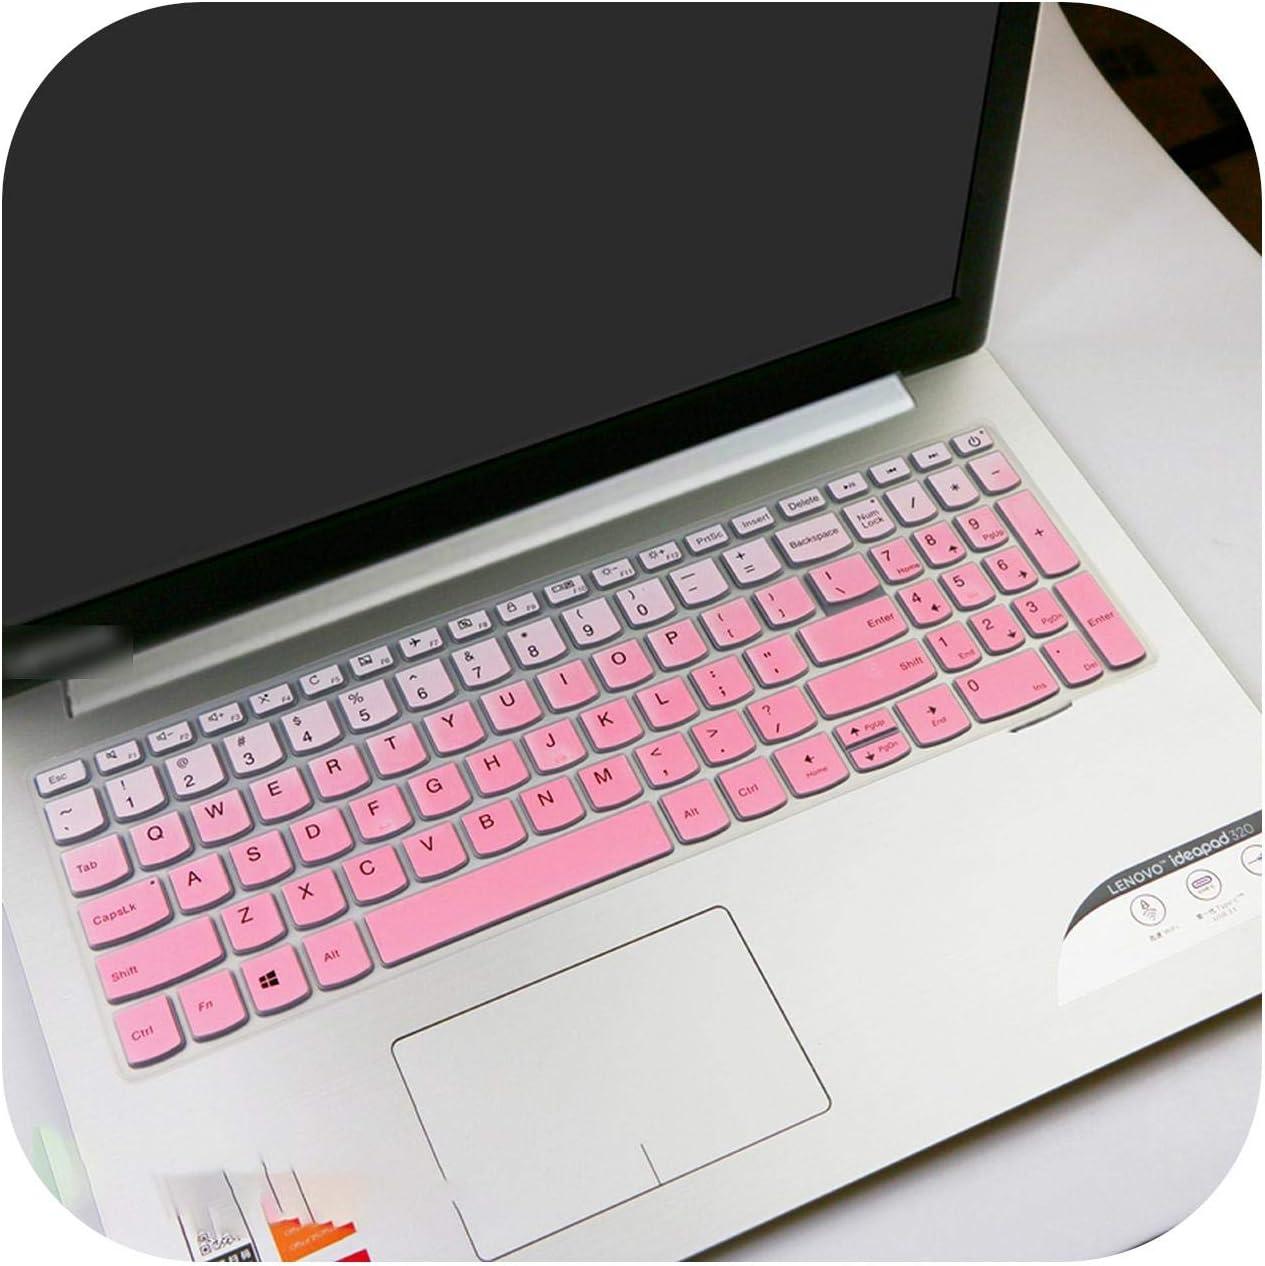 for Lenovo Ideapad 520 520 15 520 15Ikb 520 15Ikbr 720 720 15Ikba 720 15Ikbr 15.6 Inch 15 Laptop Notebook Keyboard Cover Skin-Black